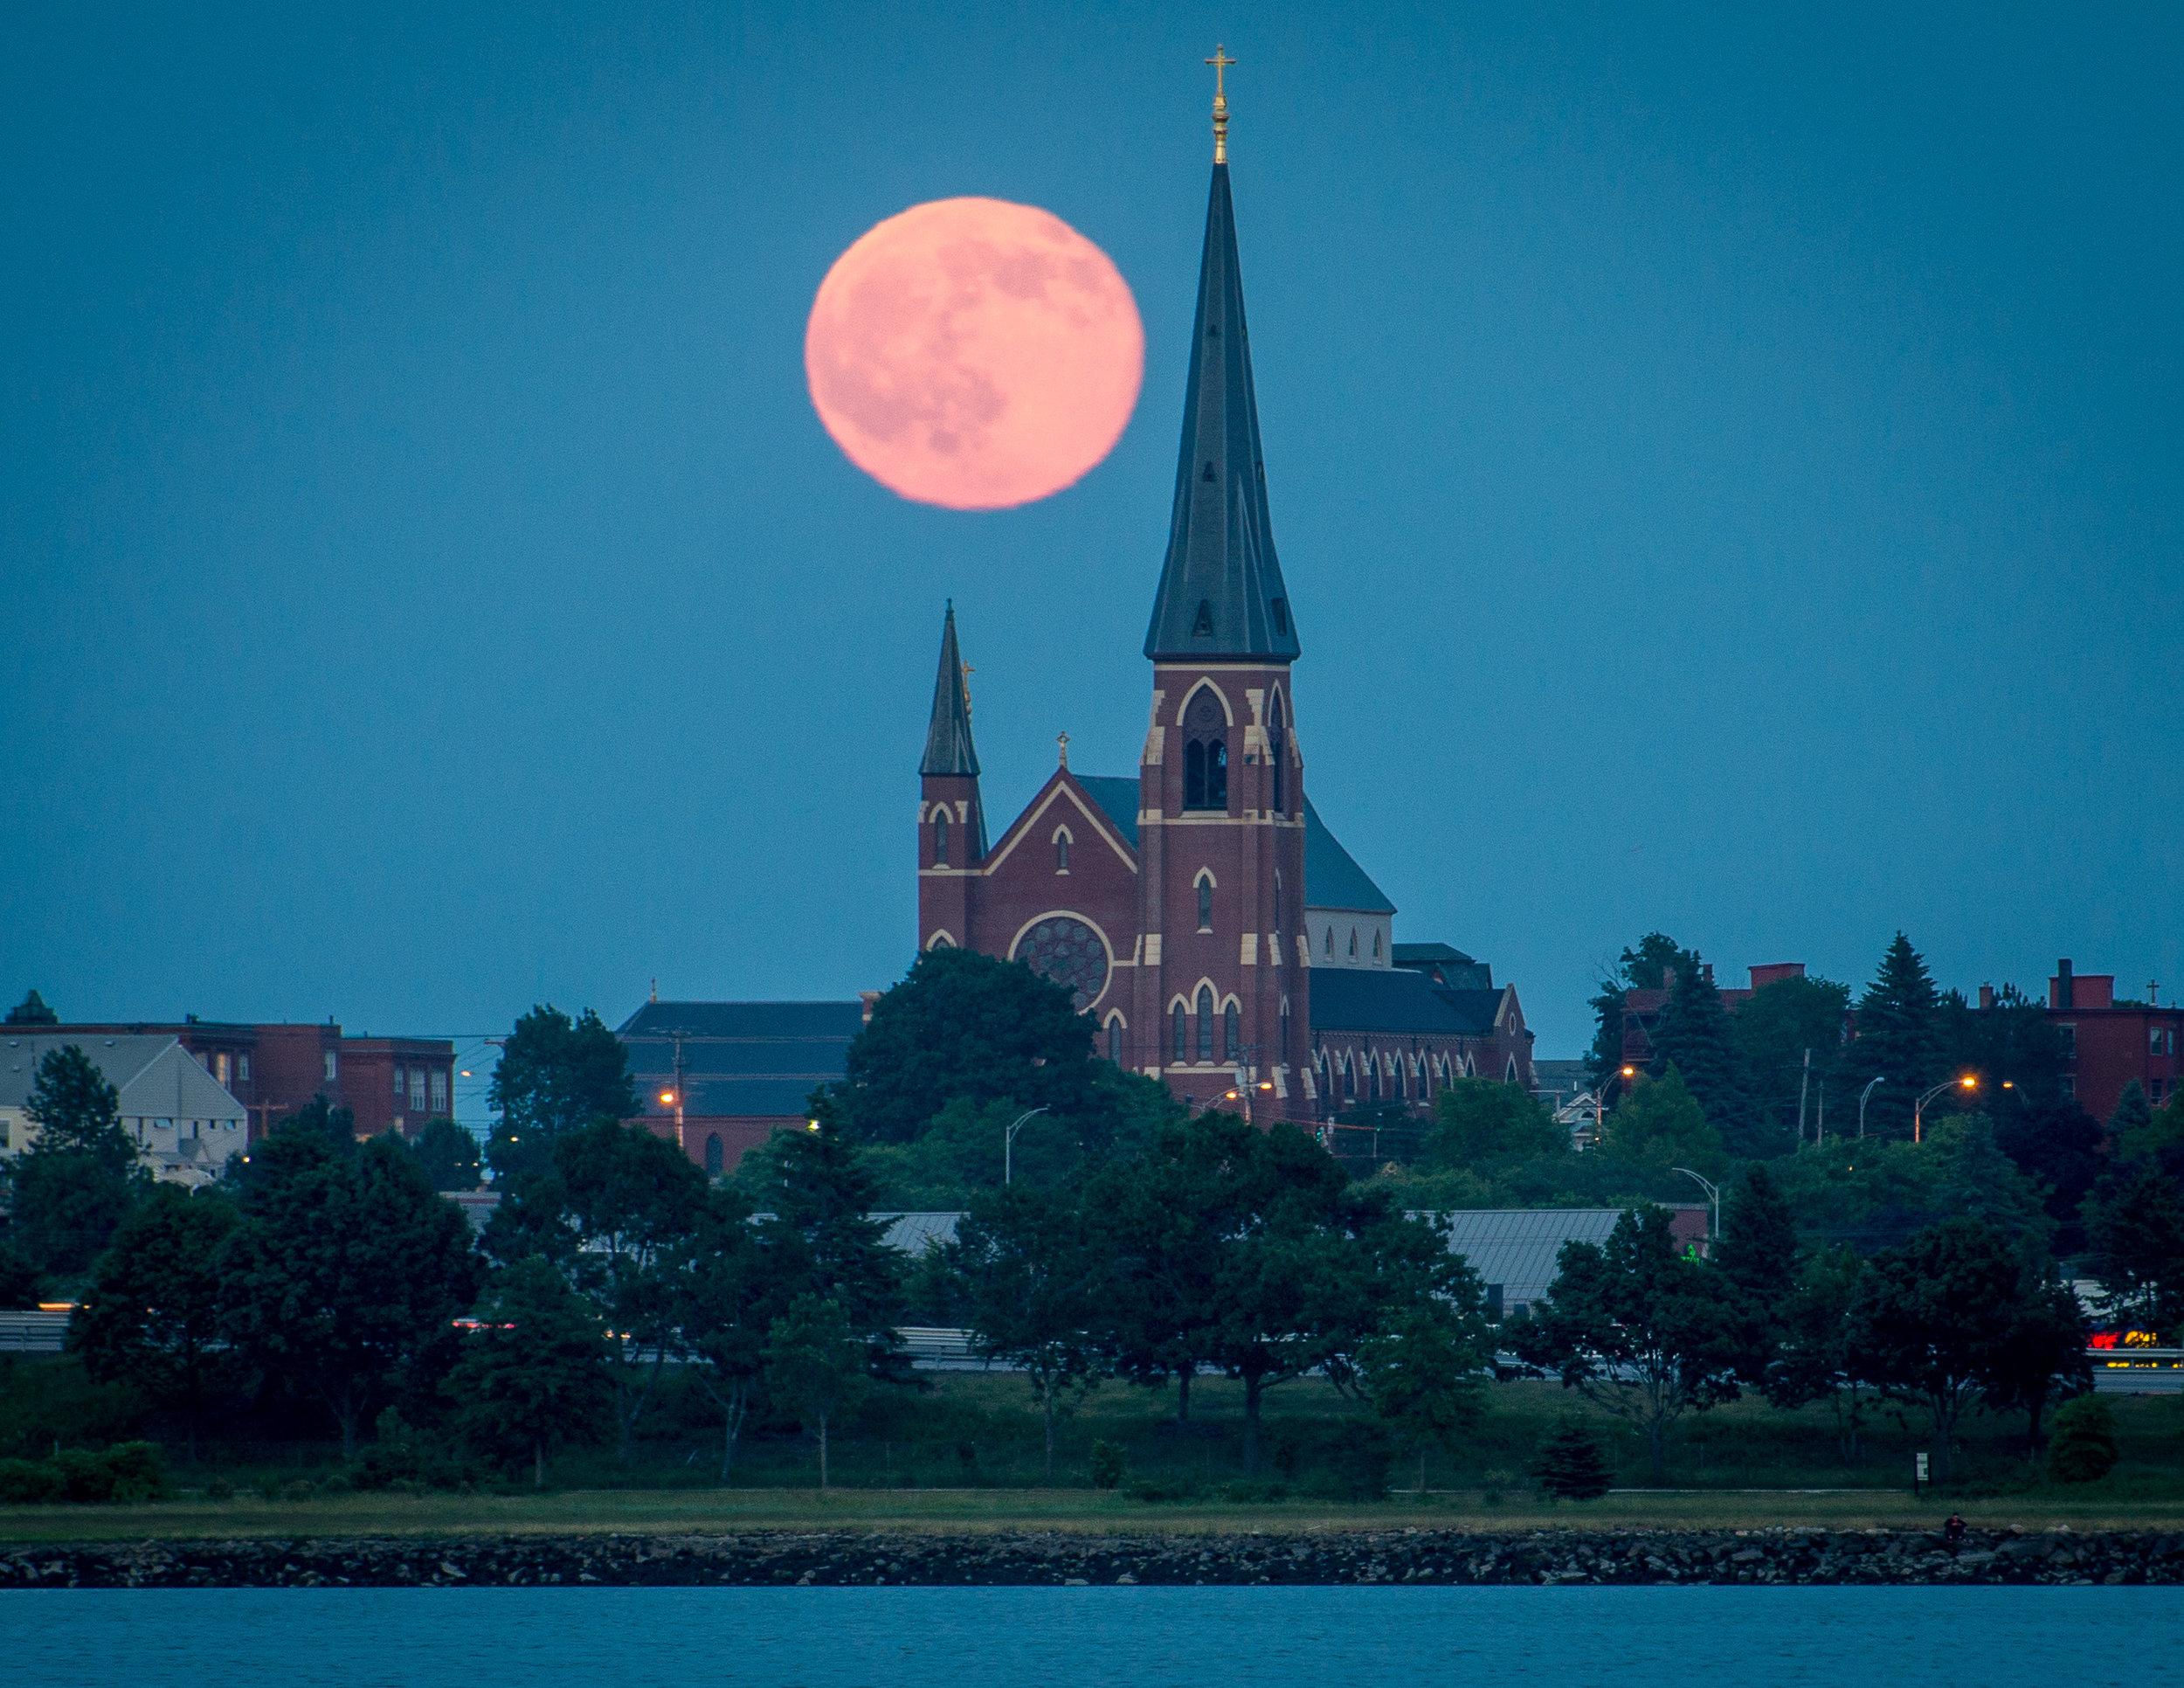 June_2016_Portland_Maine_20160620-DSC_6560 By Corey Templeton Moonrise over the Church - large.jpg